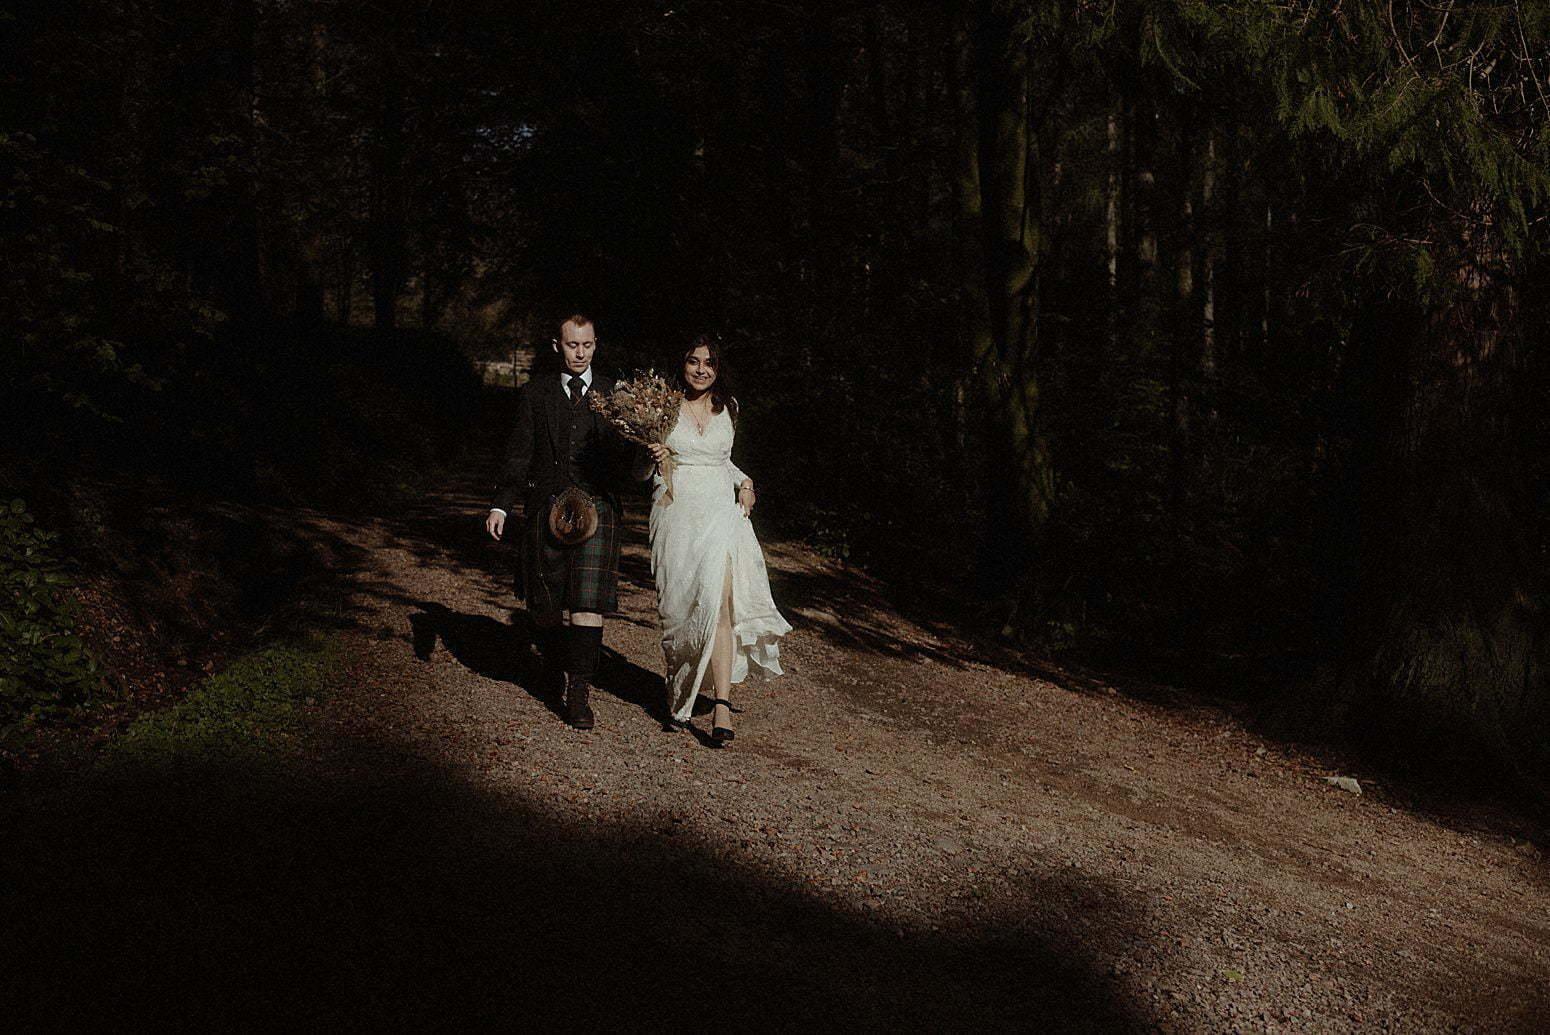 autumn elopement in scotland couple walking into the woodland of glencoe